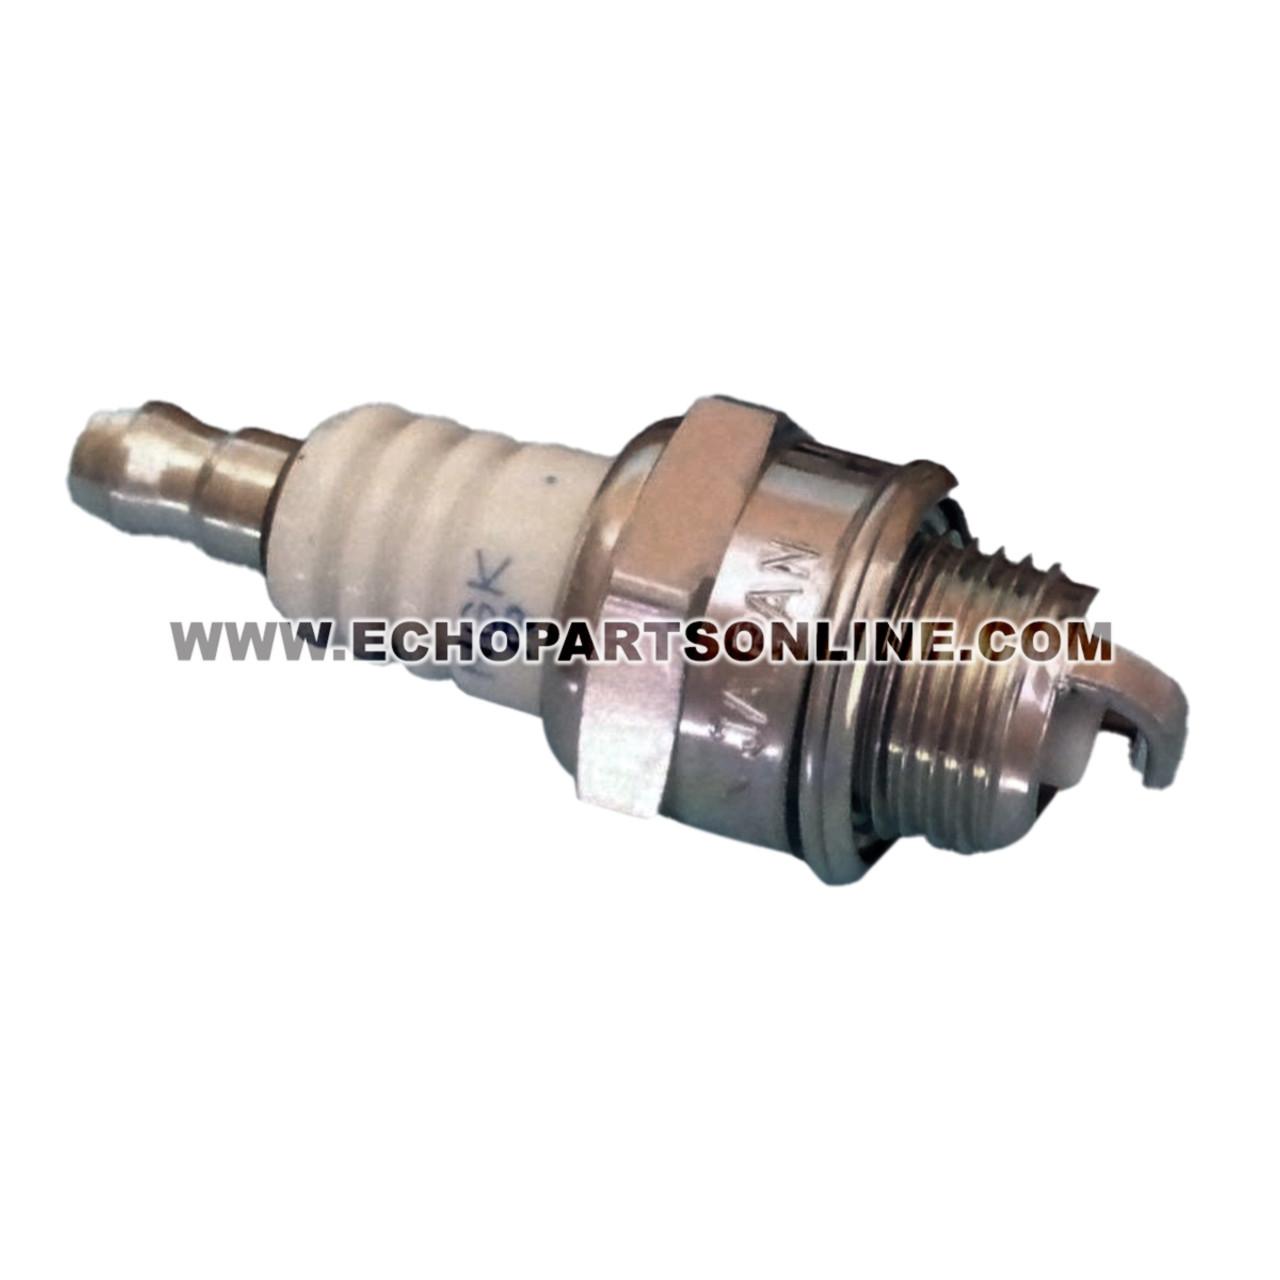 Echo GT 2000 Spark Plug 15901010230 OEM